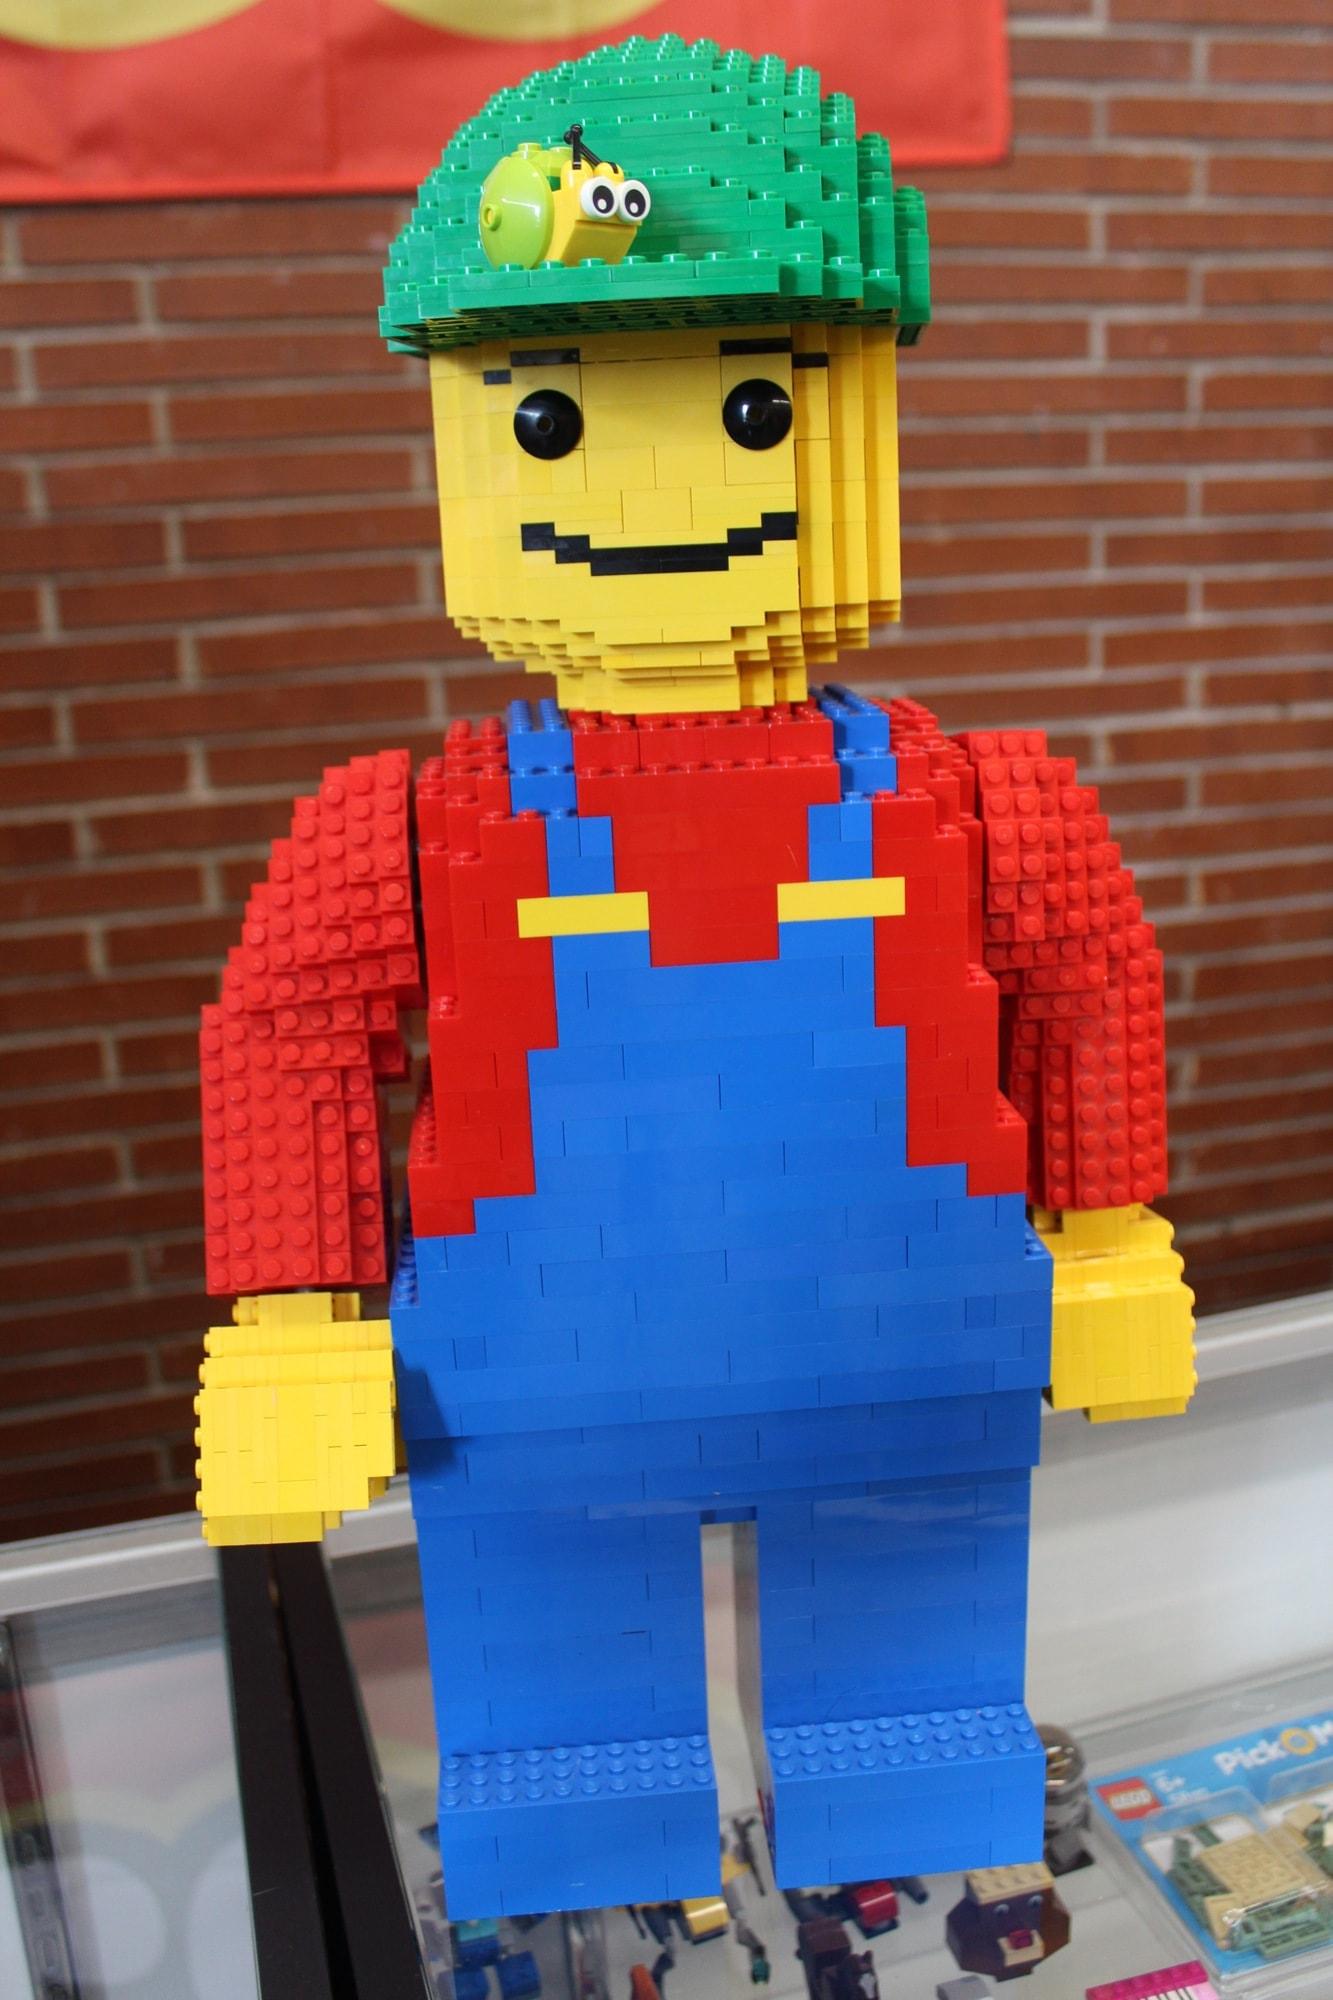 Let go my LEGO | Plant City Observer